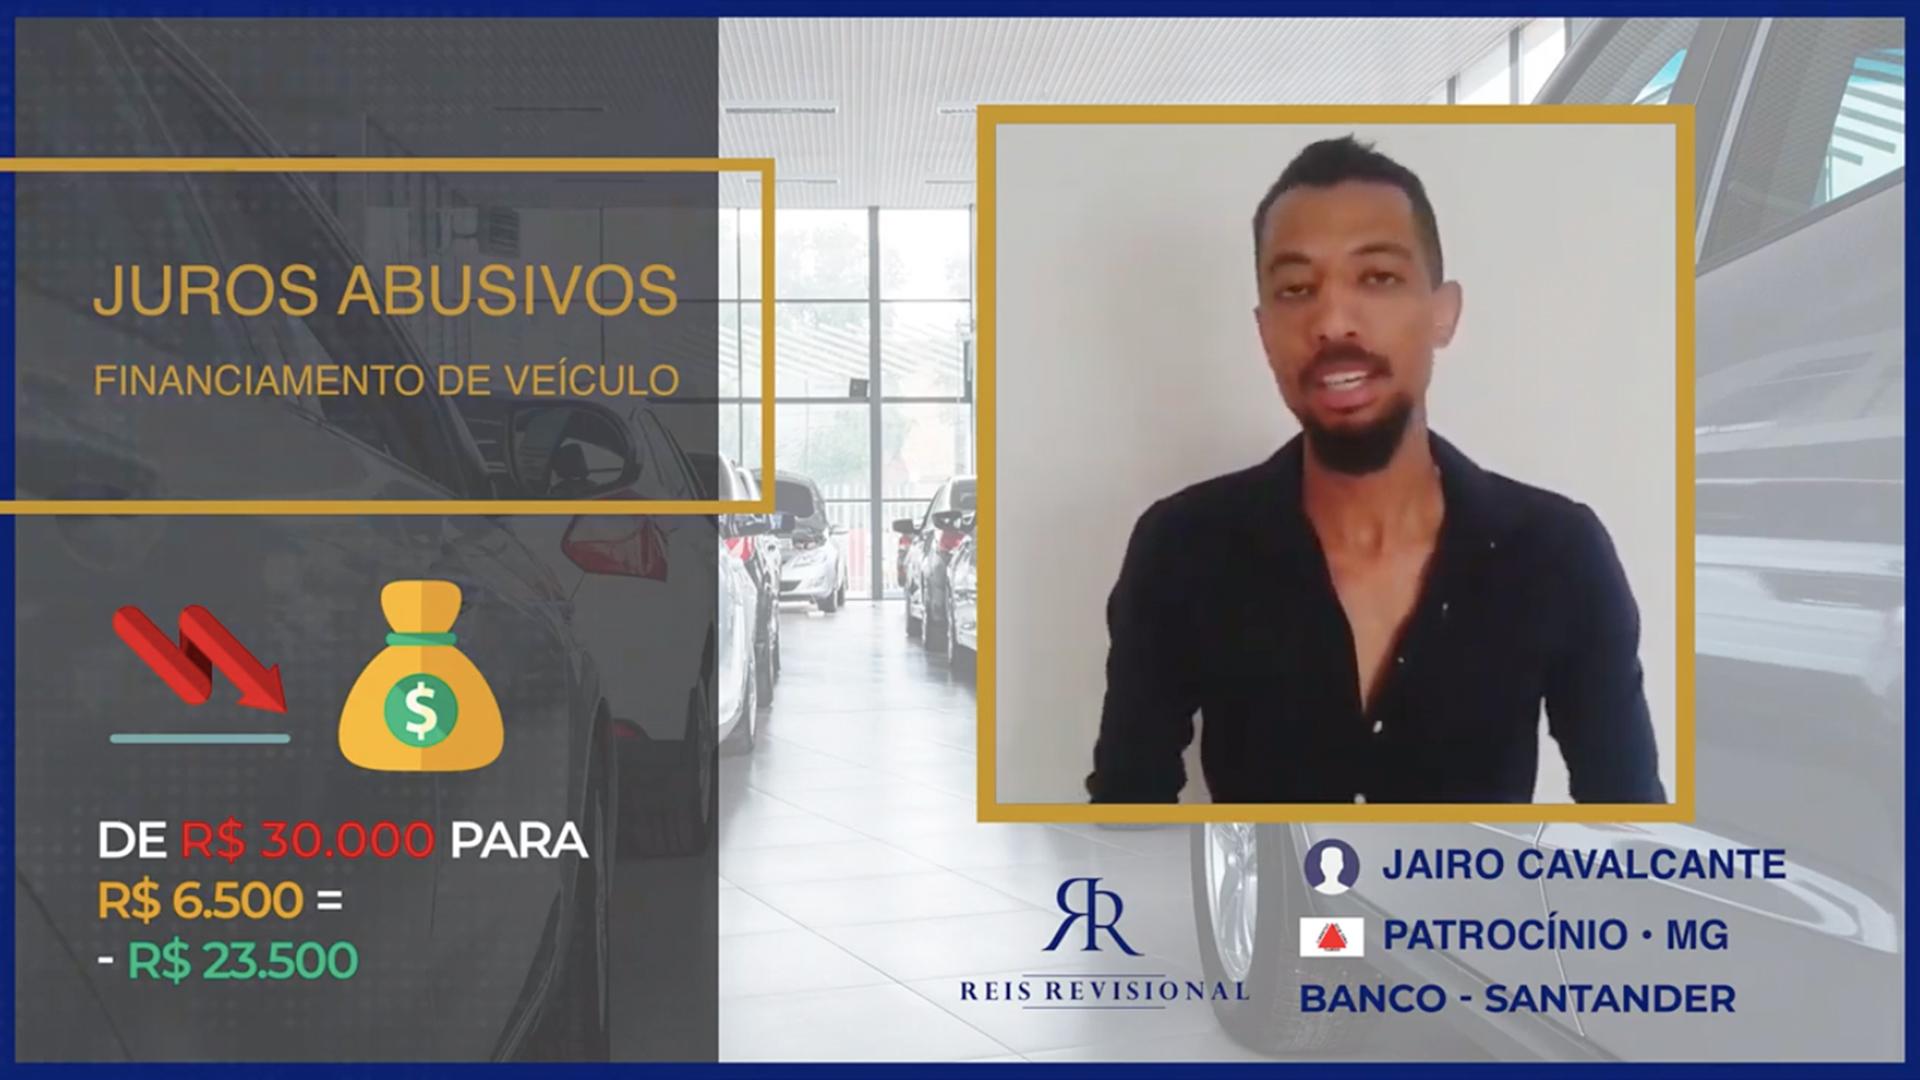 Jairo Cavalcante